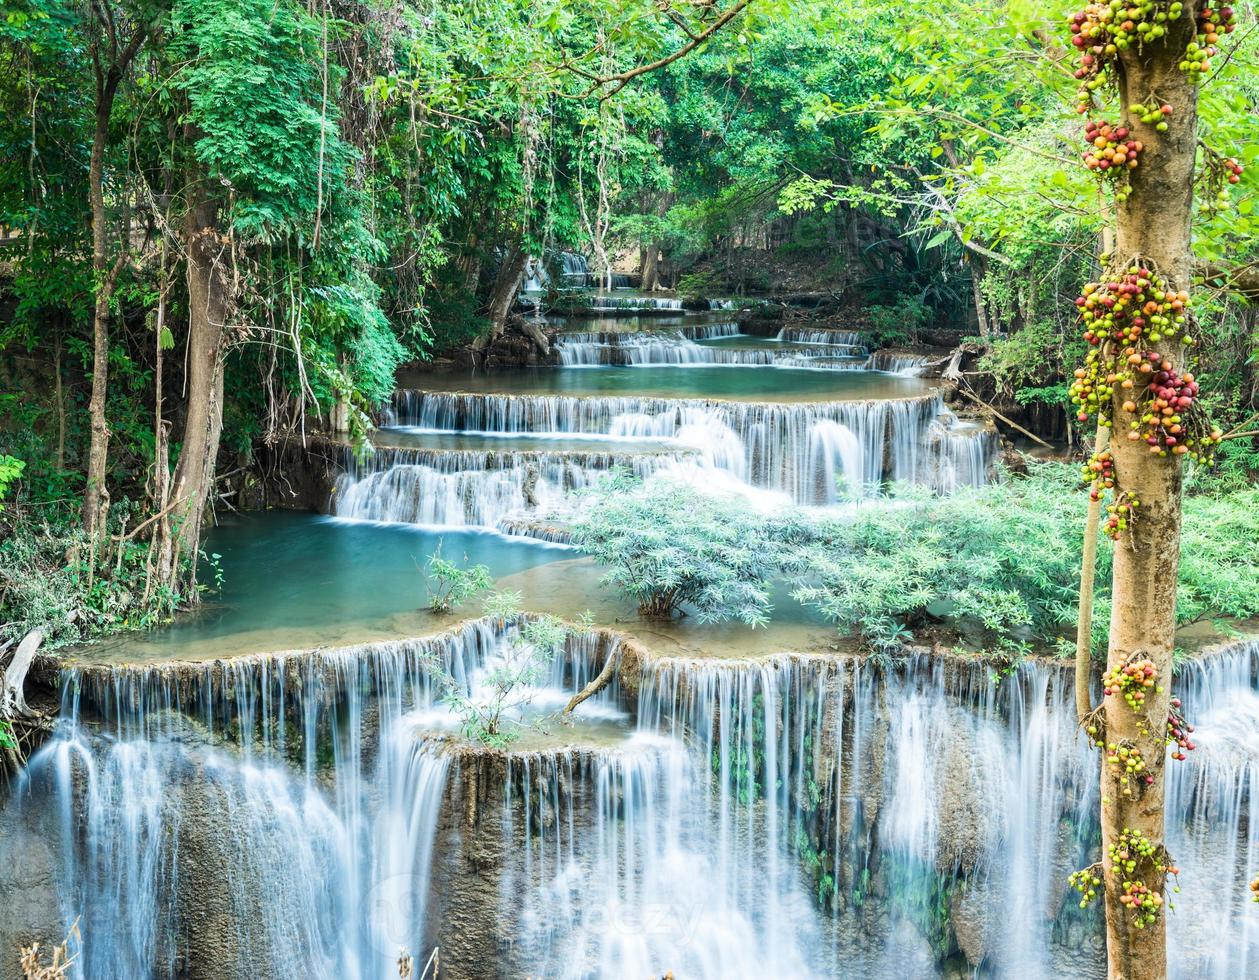 Cascata profonda della foresta a Huay Mae Kamin, Kanchanaburi, Tailandia foto